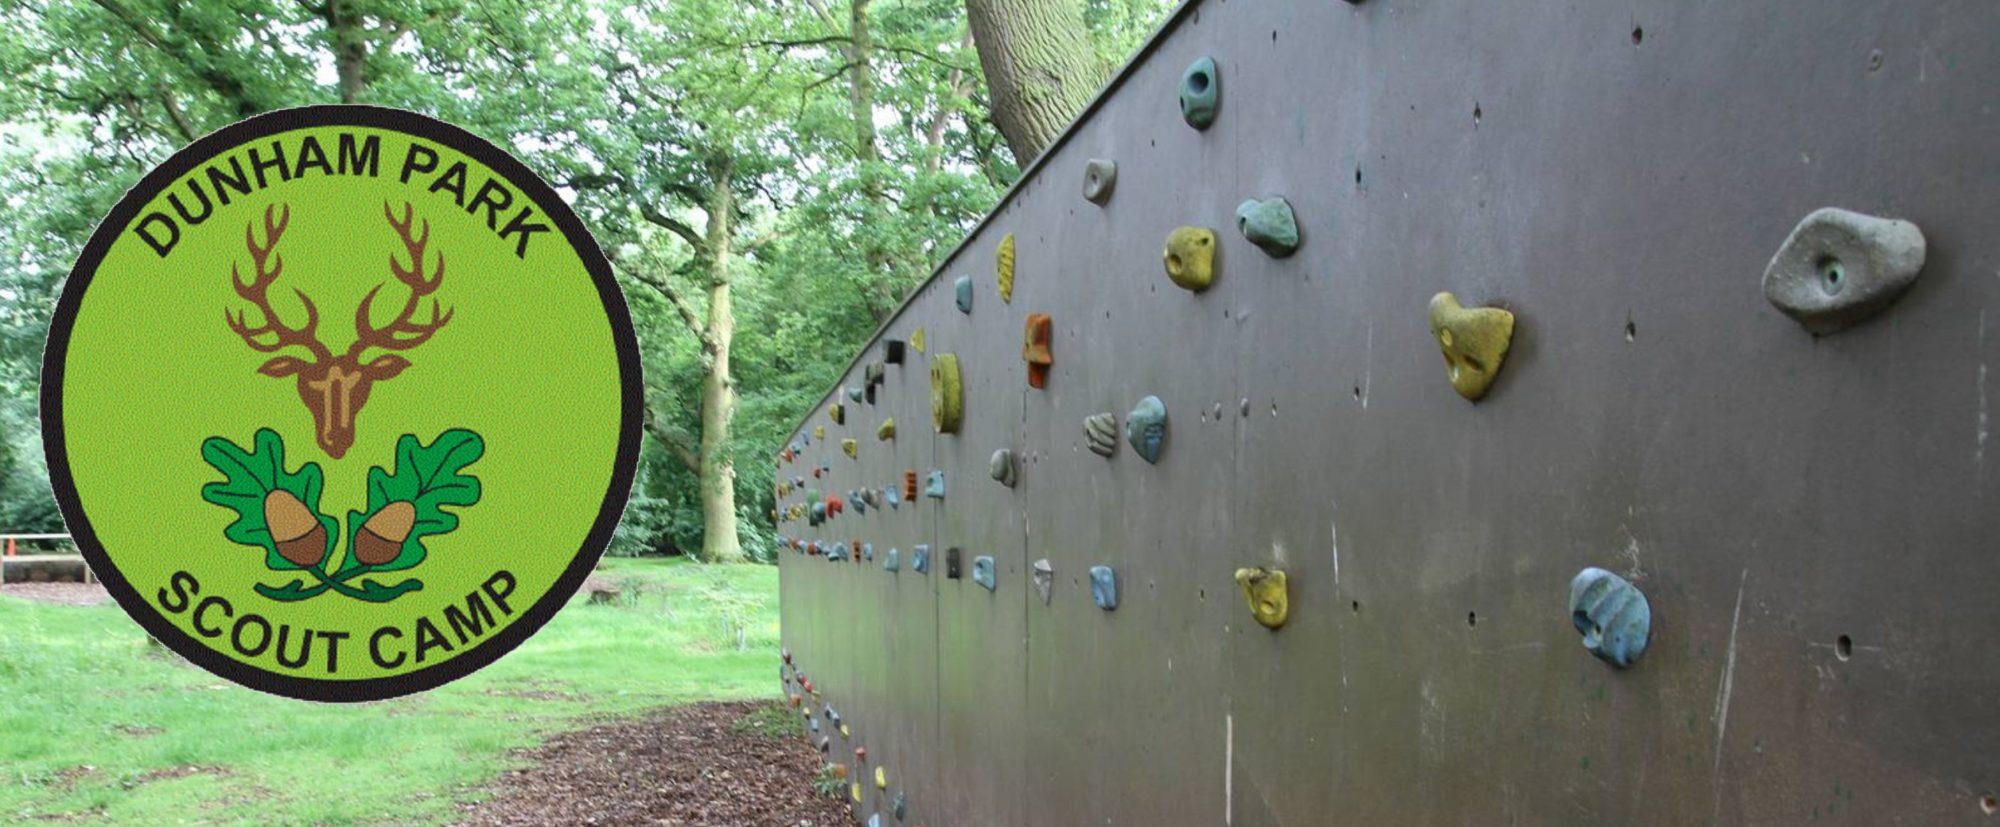 Dunham Park Scout Camp